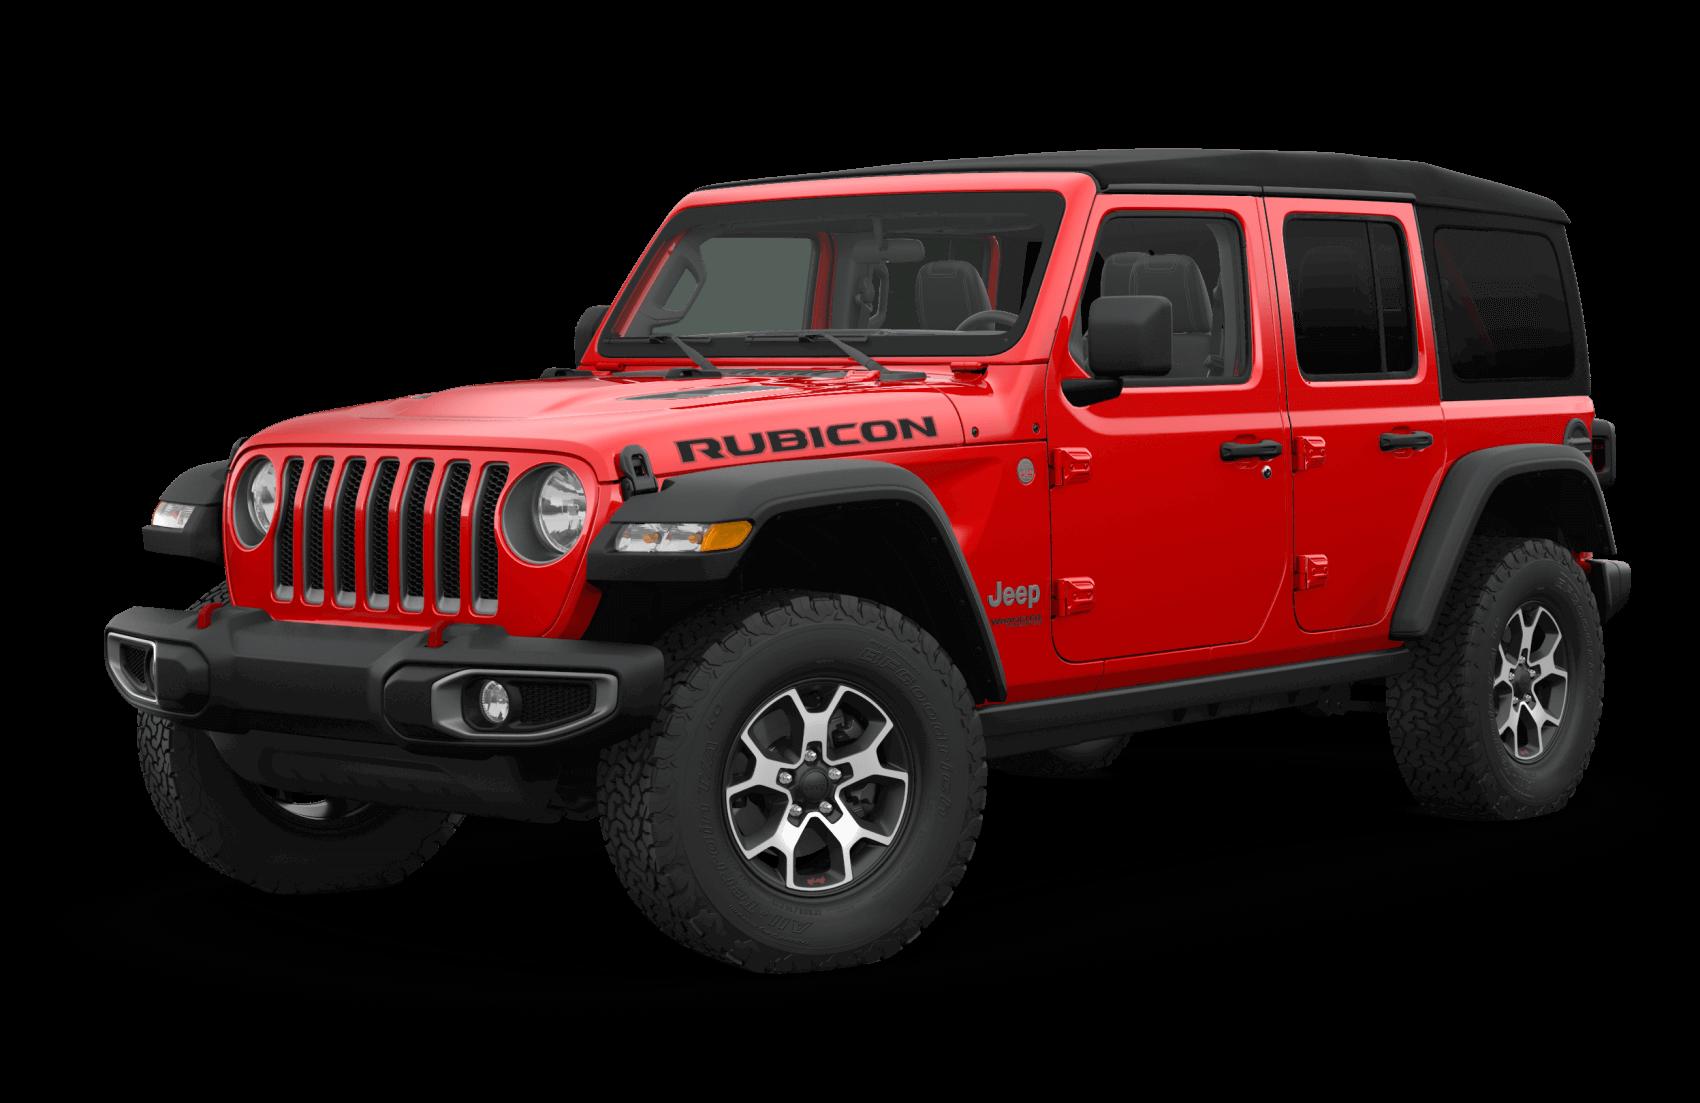 2021 Jeep Wrangler Red